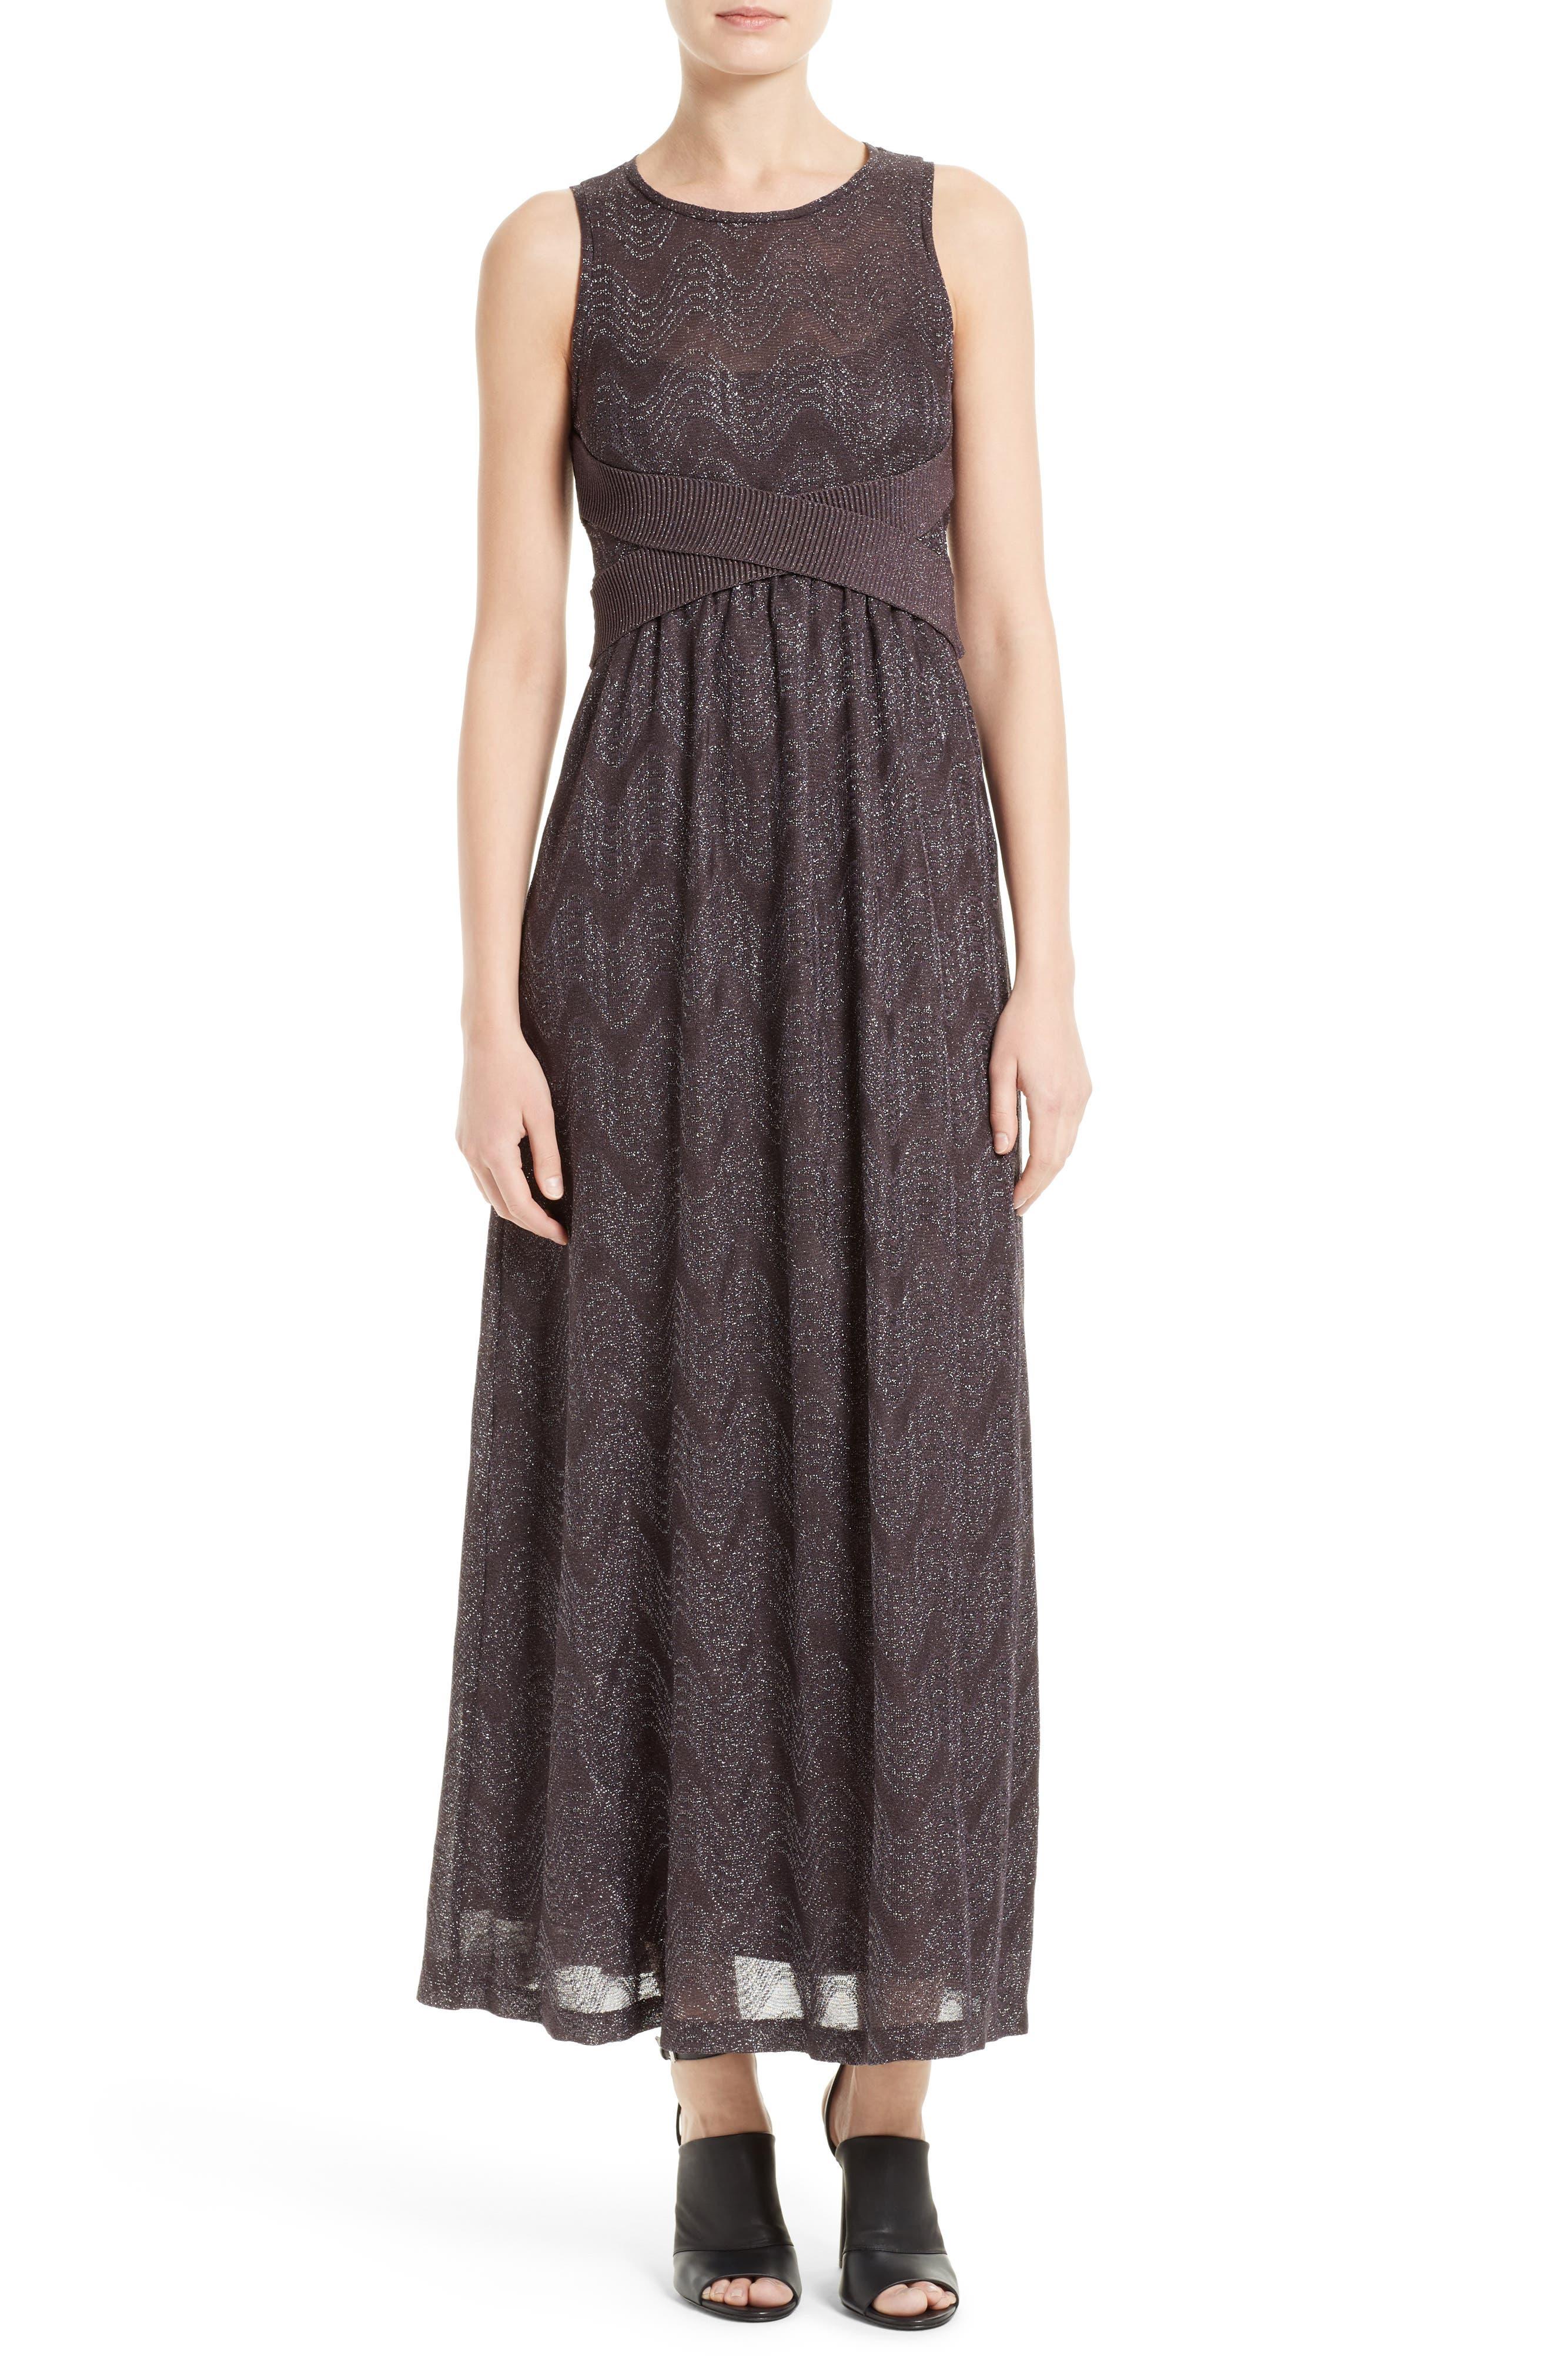 Main Image - M Missoni Metallic Maxi Dress